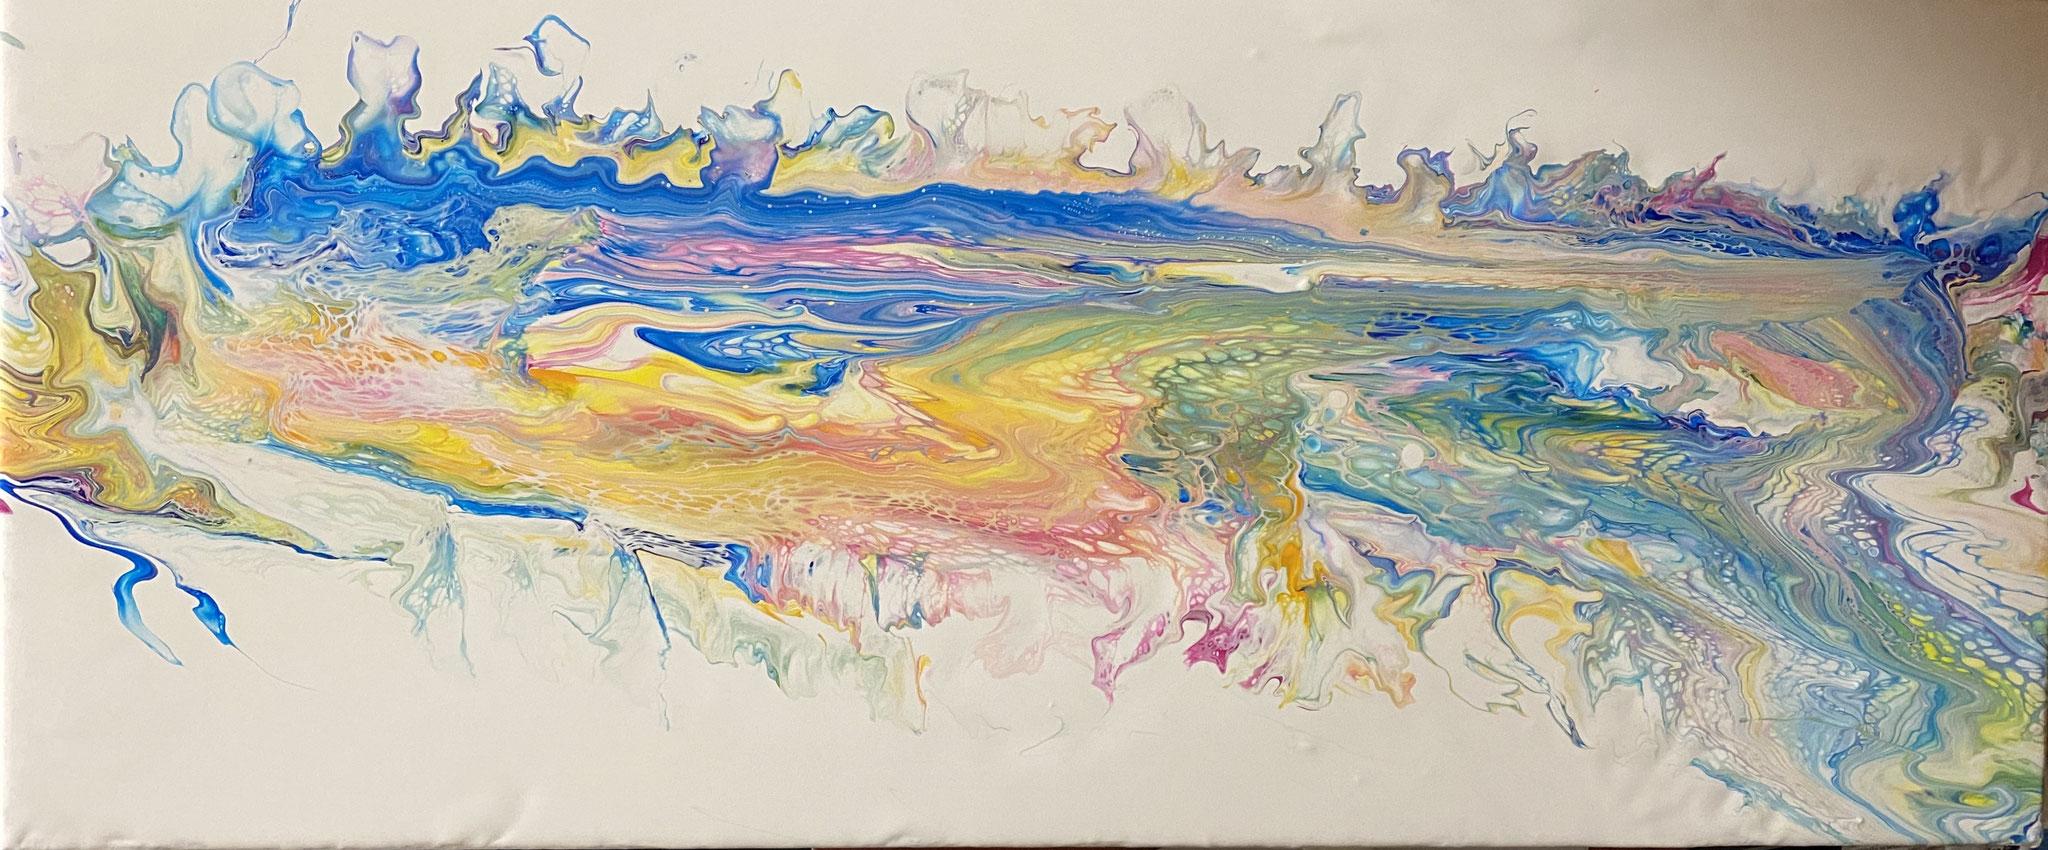 NR.5 Streched Canvas Rainbow